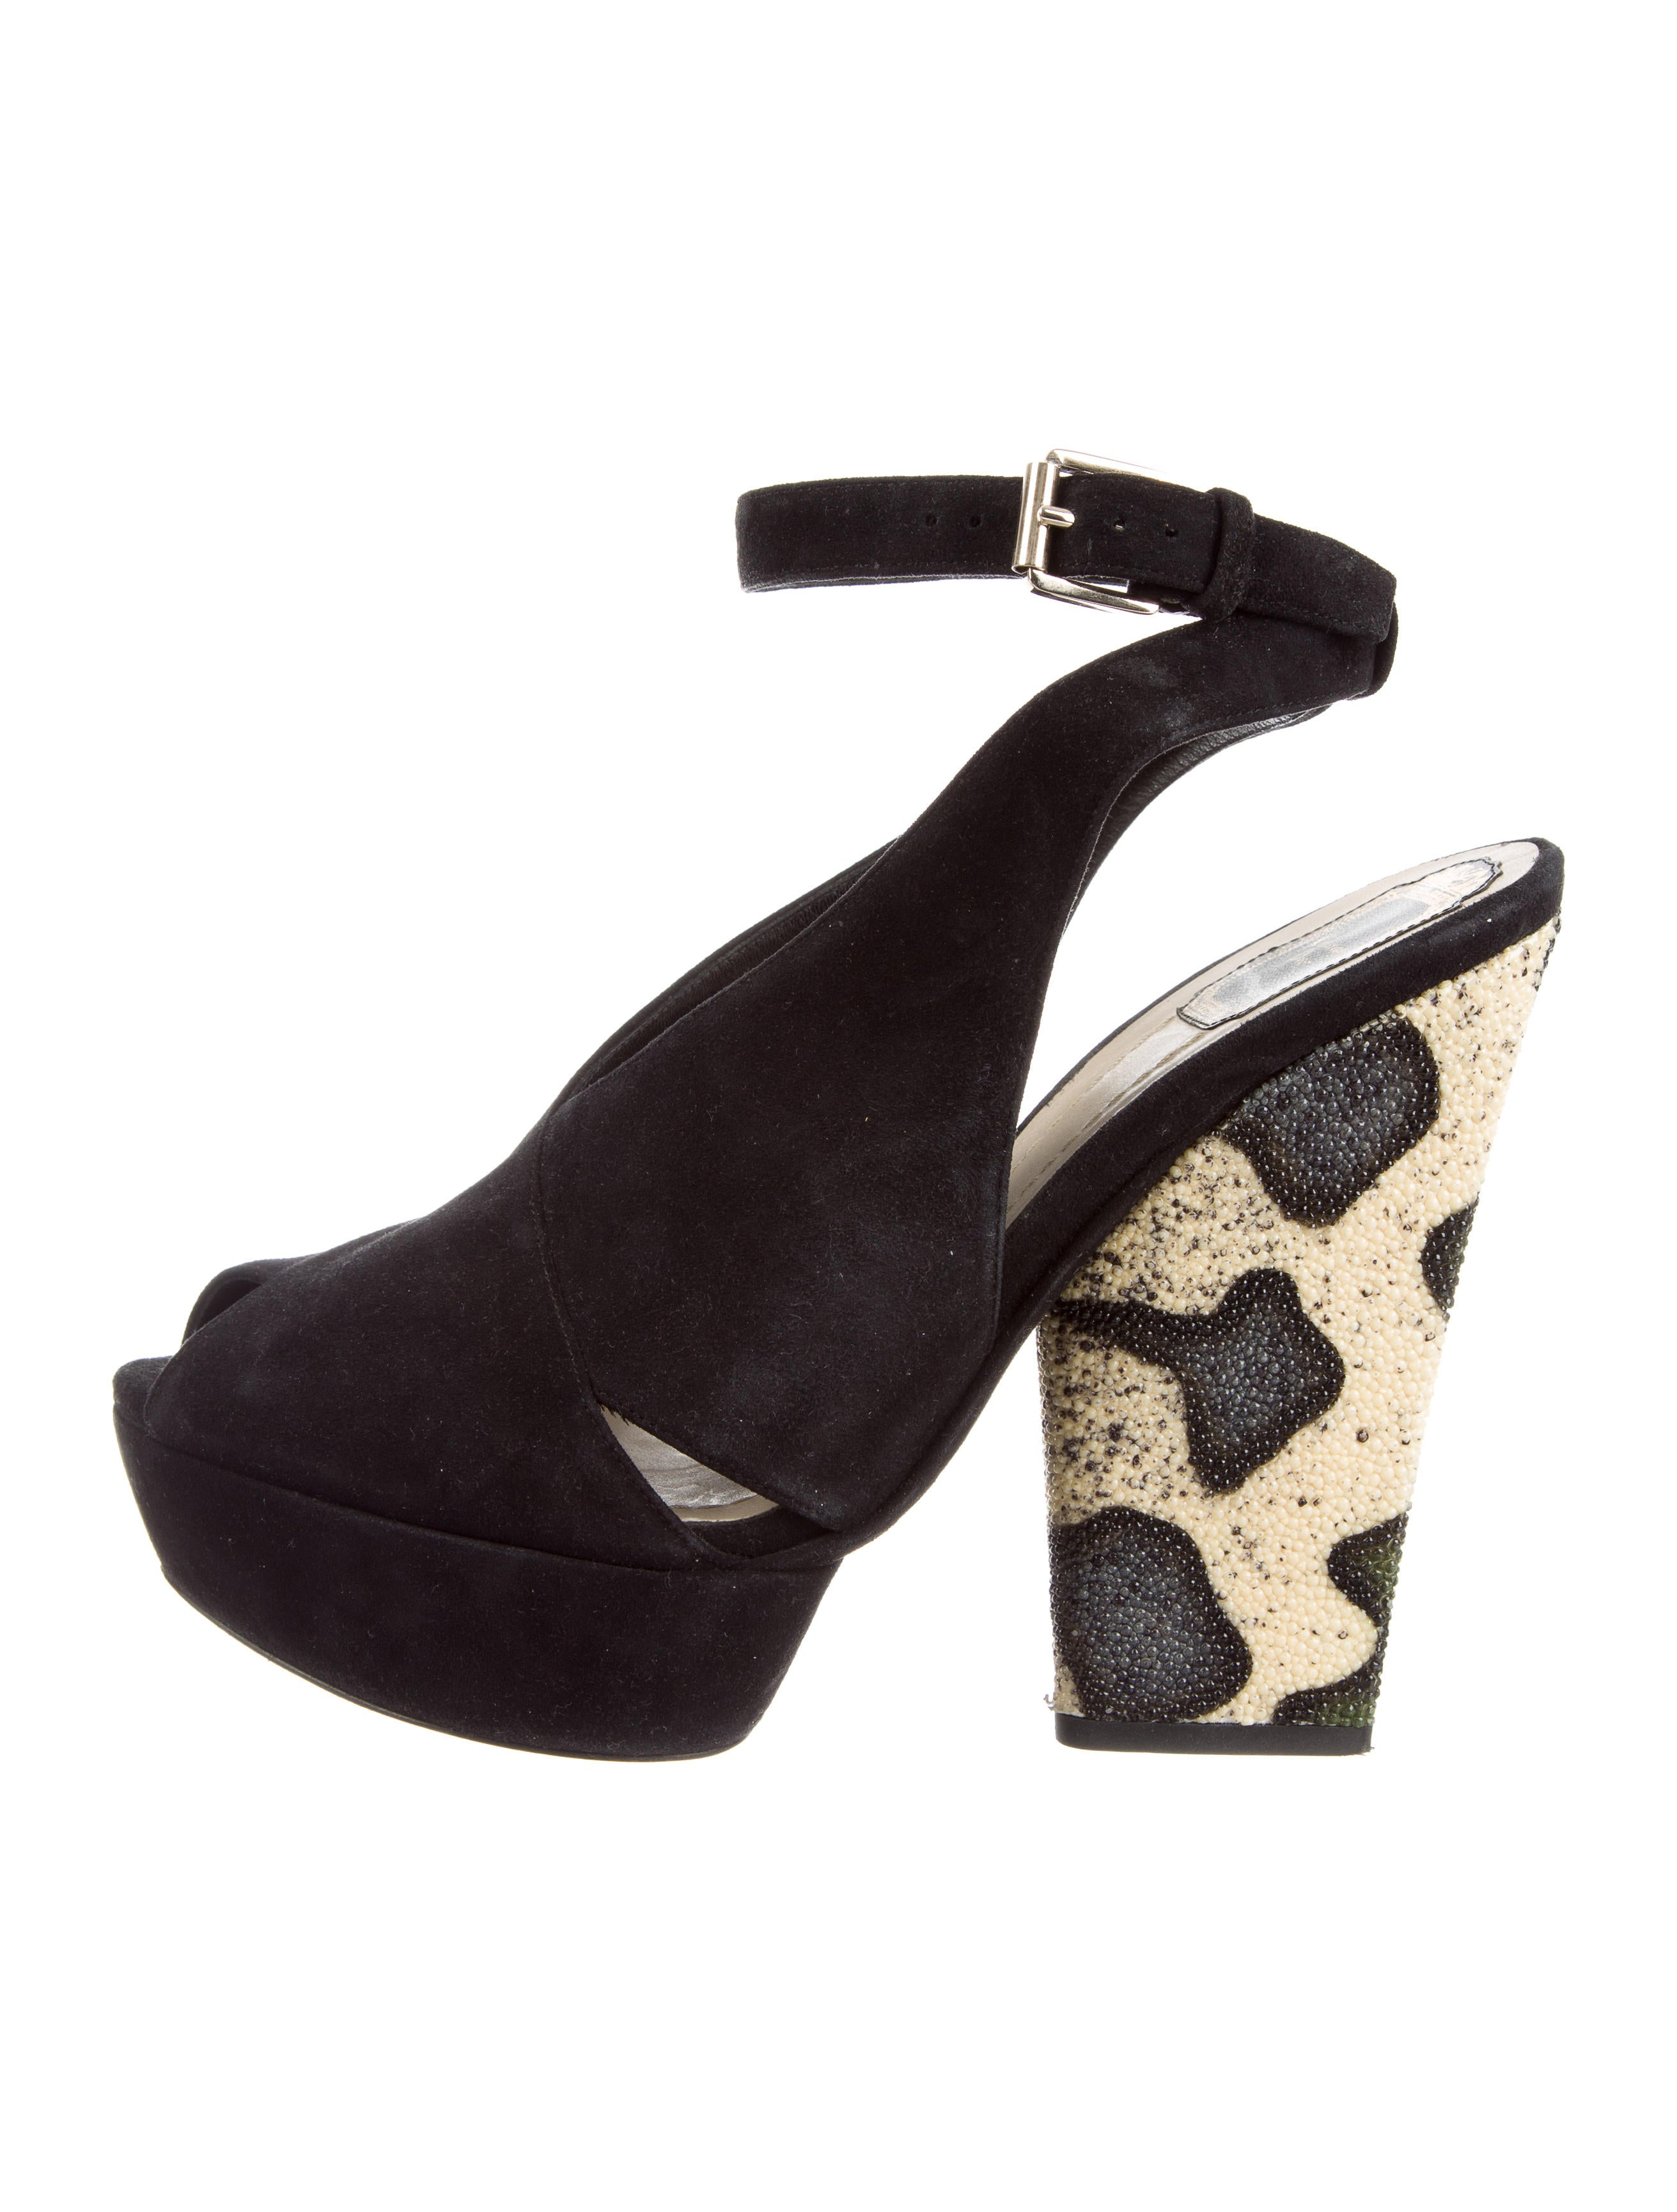 sale 2014 unisex Christian Dior Stingray-Trimmed Platform Sandals buy cheap good selling PyyrikLP